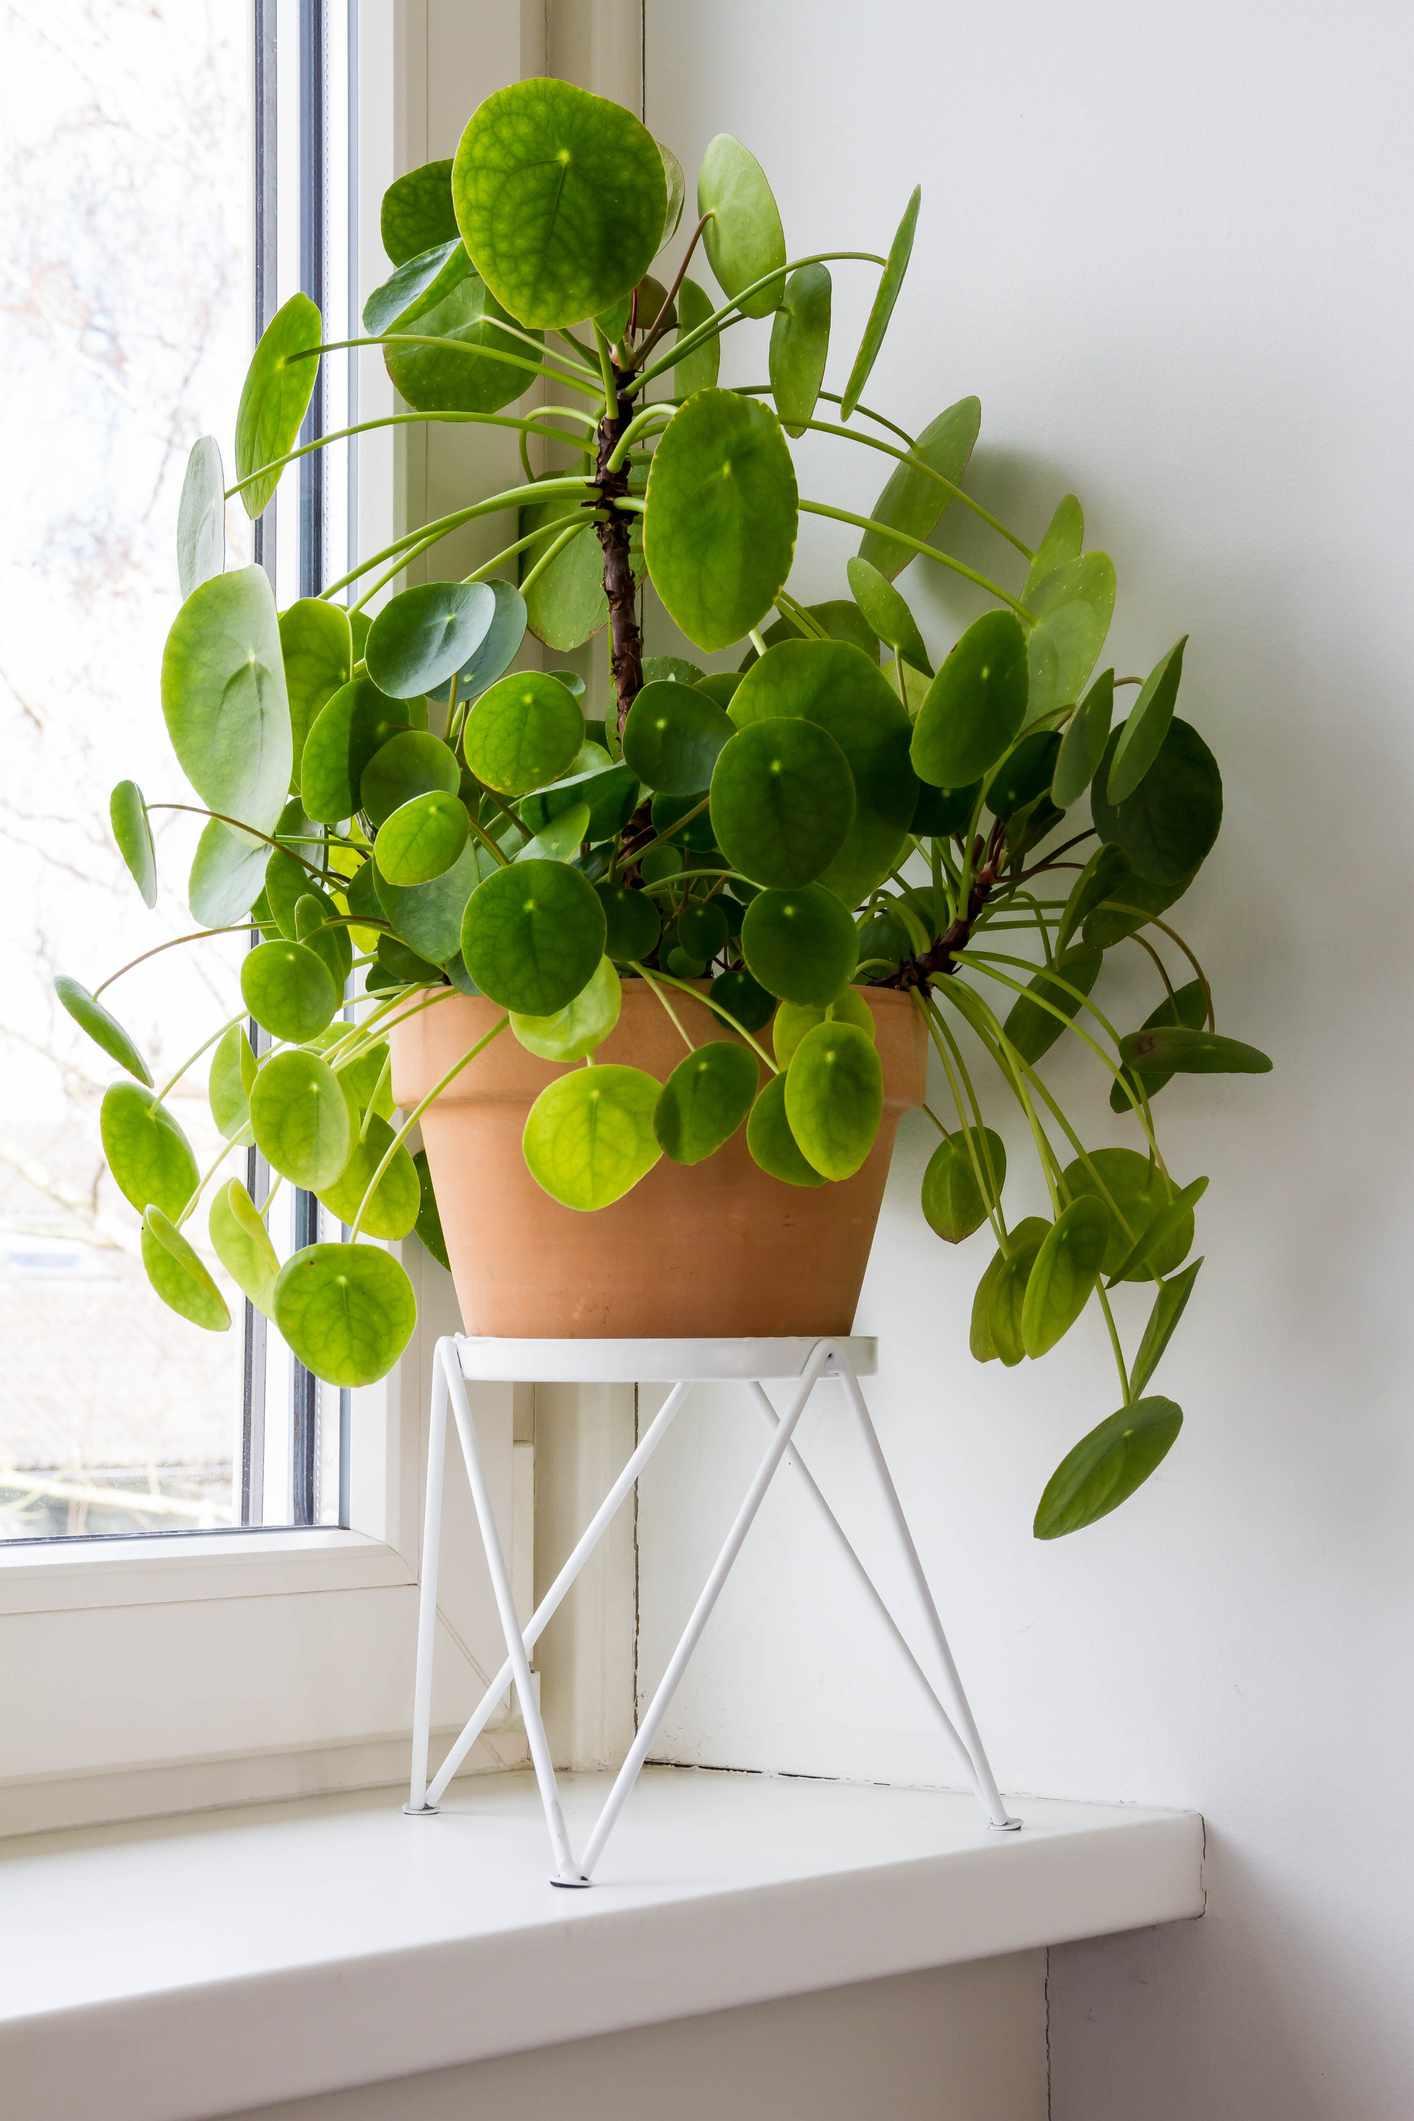 Large pilea peperomioides in a terra cotta pot on a windowsill